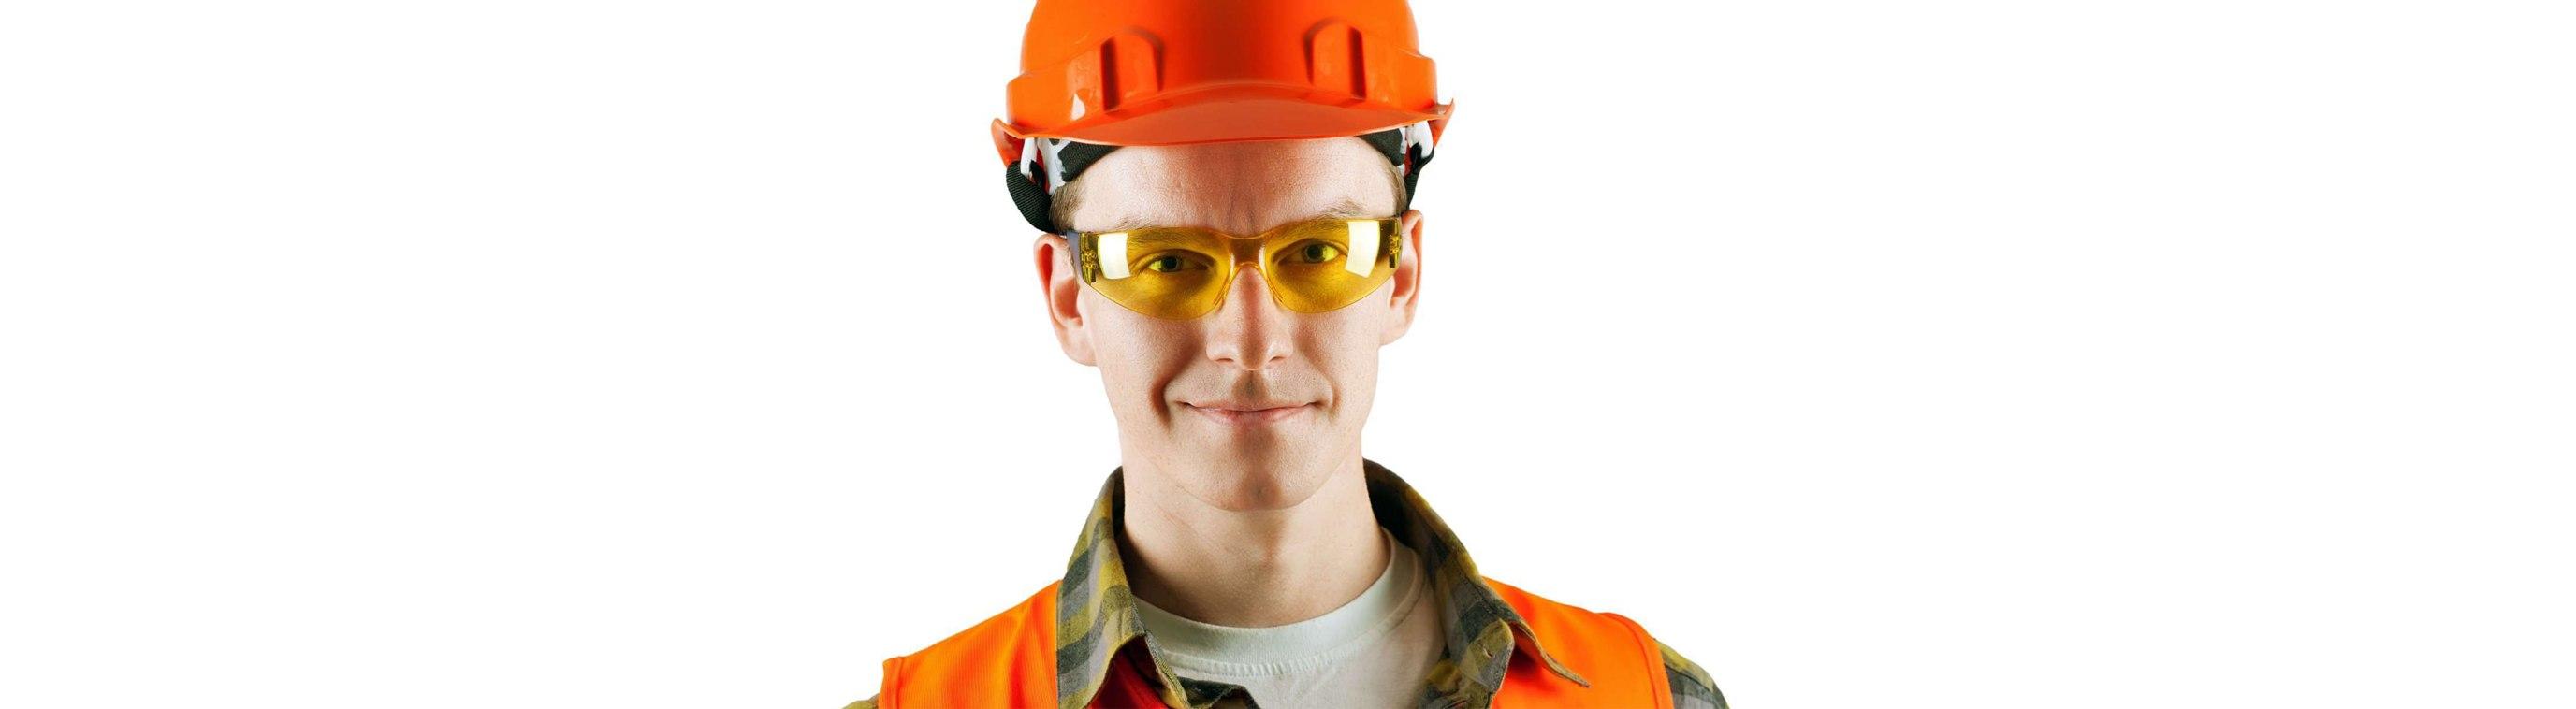 f29a03d34208 Prescription Safety Glasses   Safety Sunglasses Online in SW Edmonton